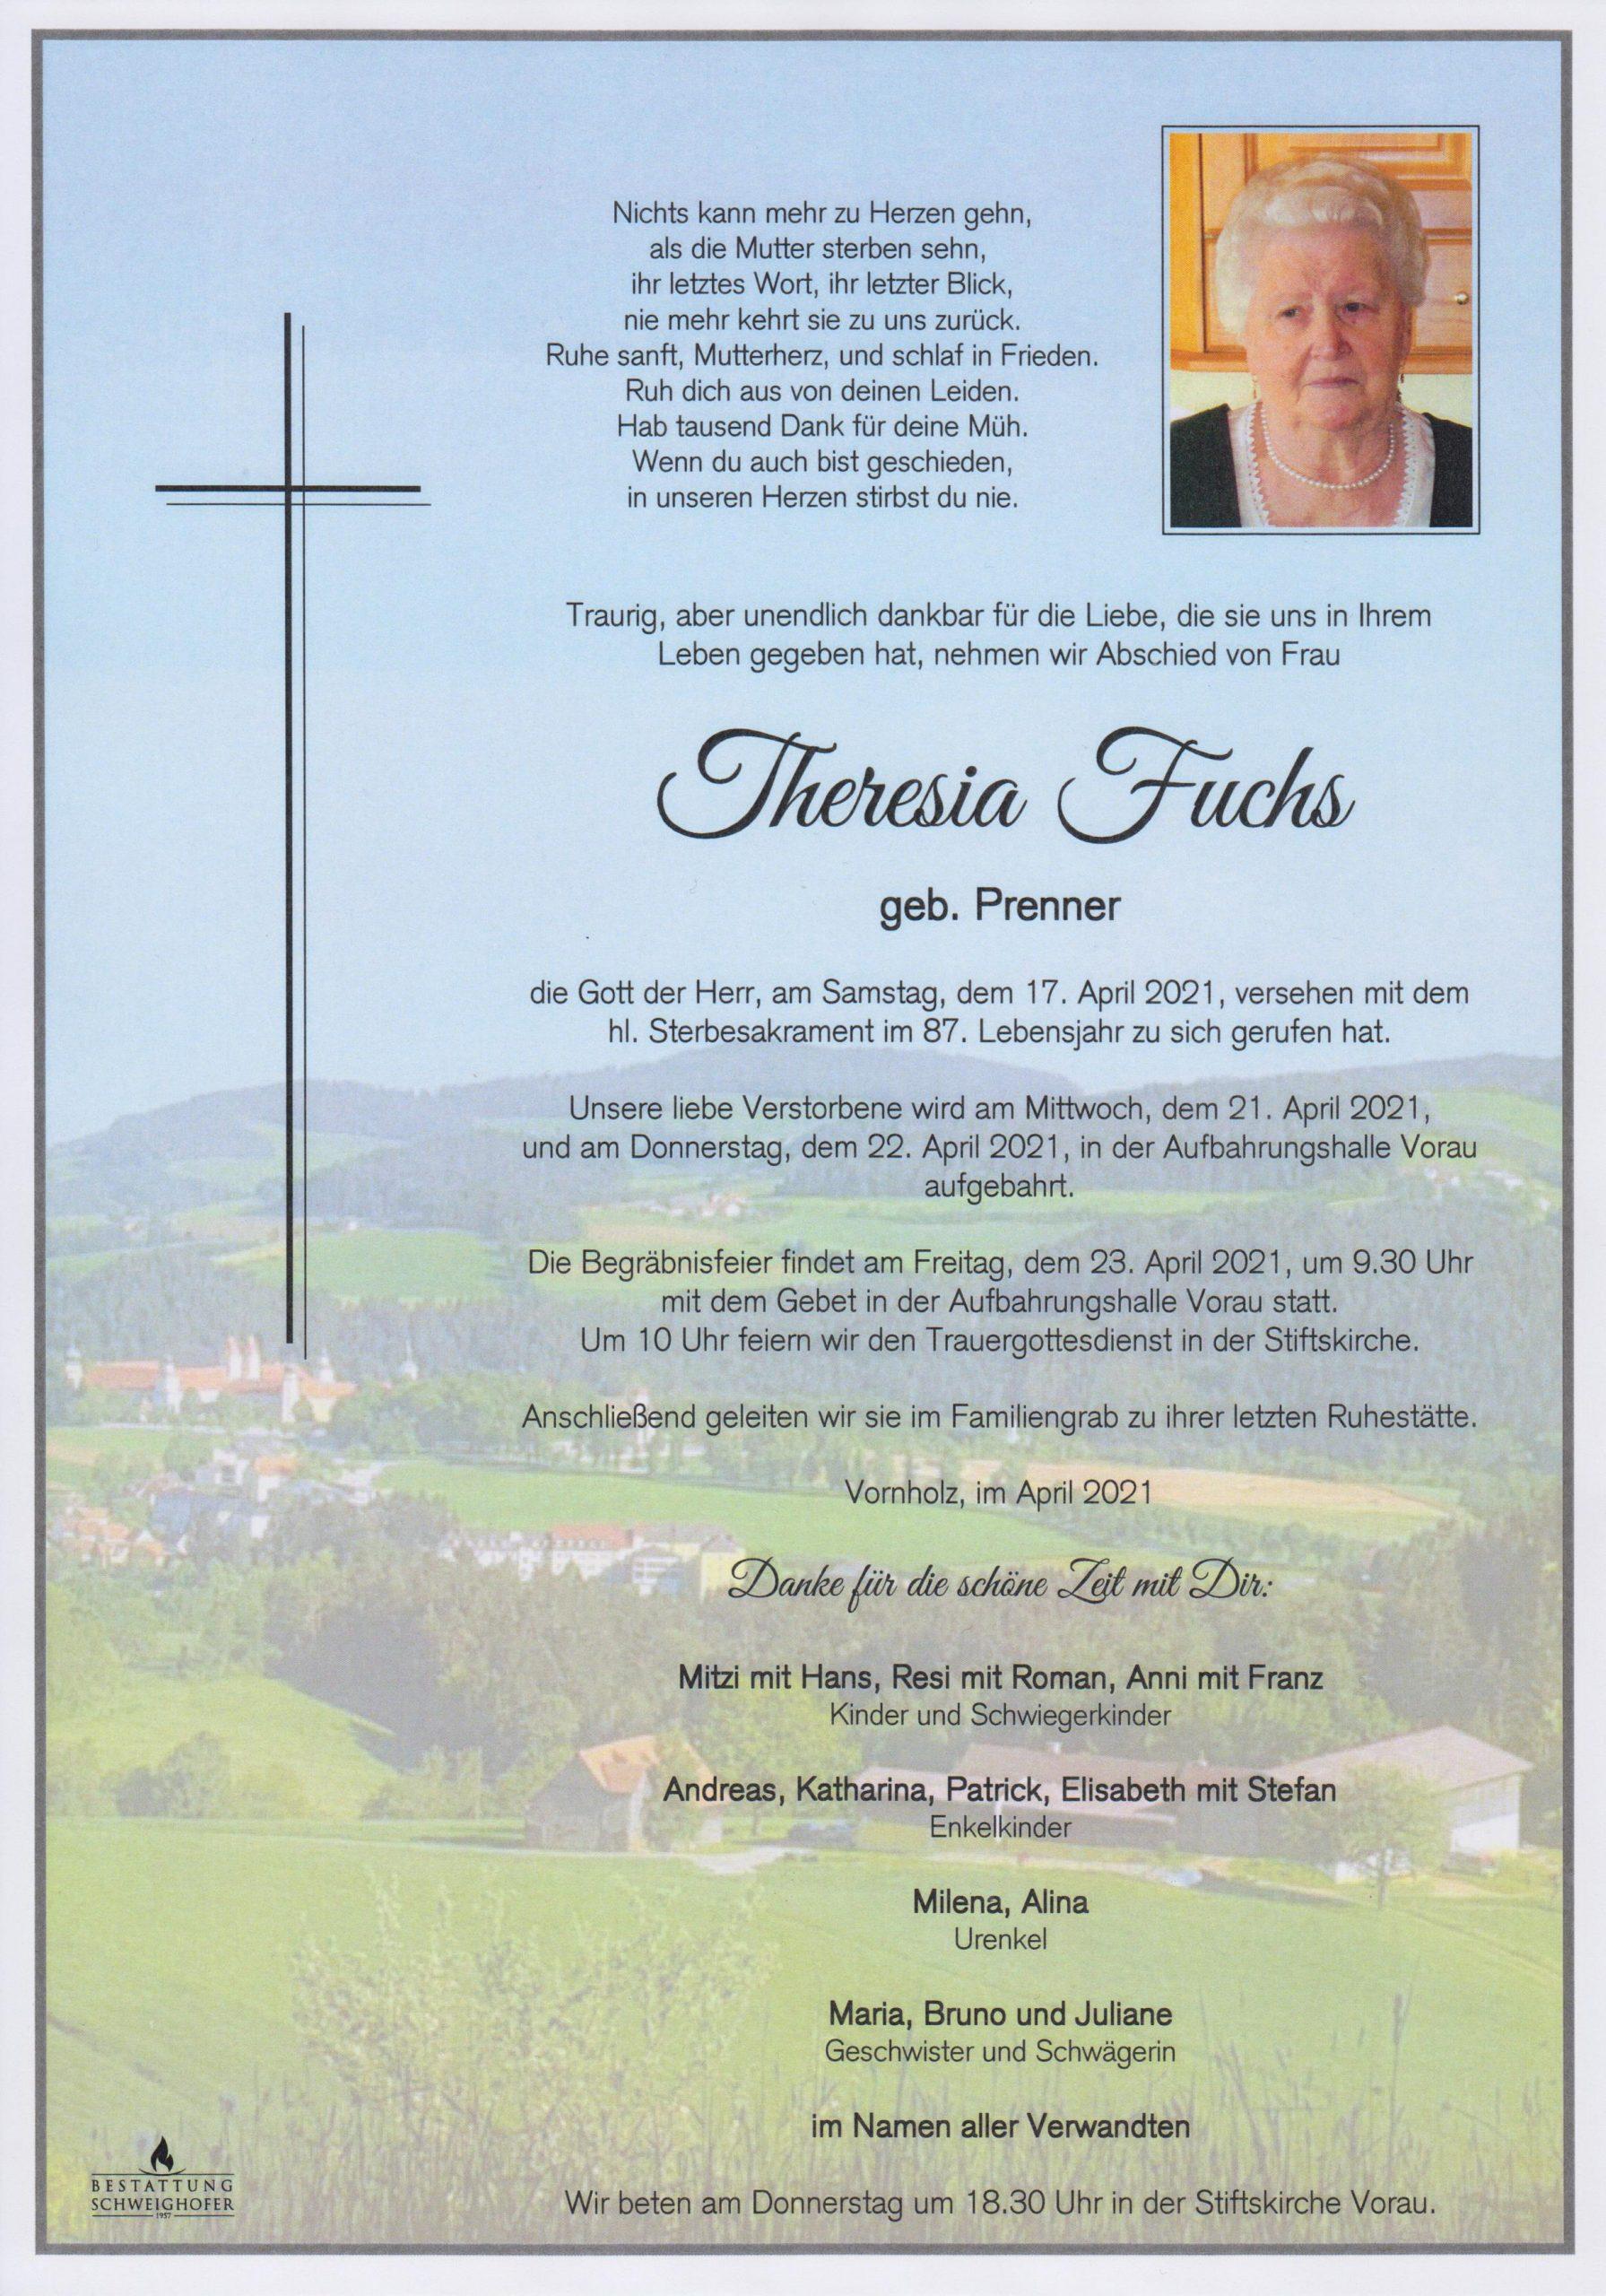 Theresia Fuchs